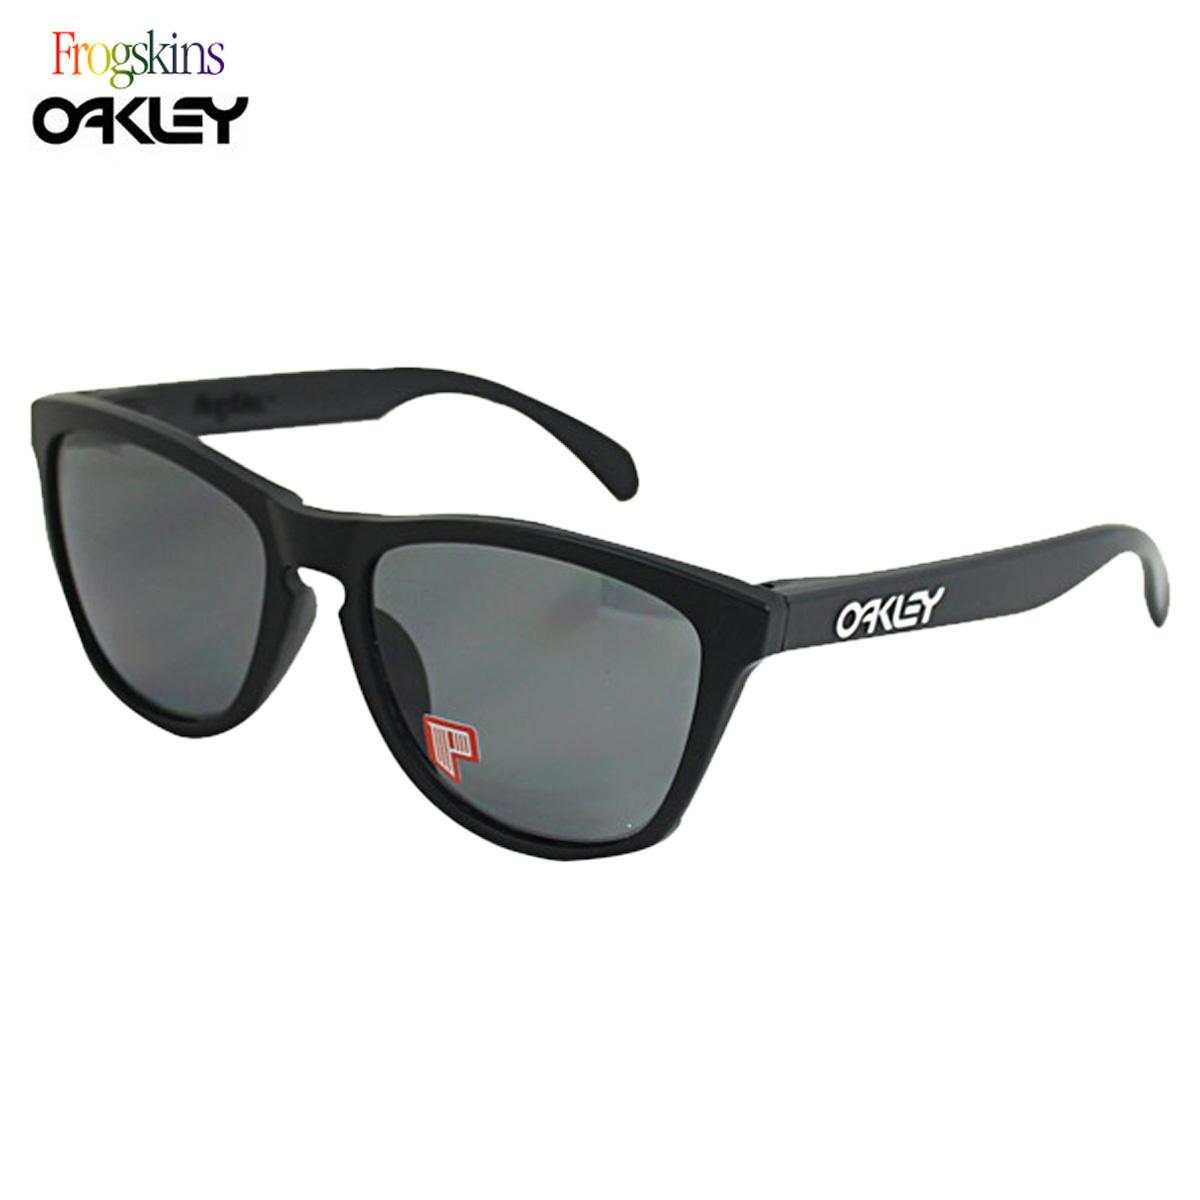 5184a1a972af reduced allsports rakuten global market oakley oakley sunglasses frogskins  asian fit frog skin mens womens polarized